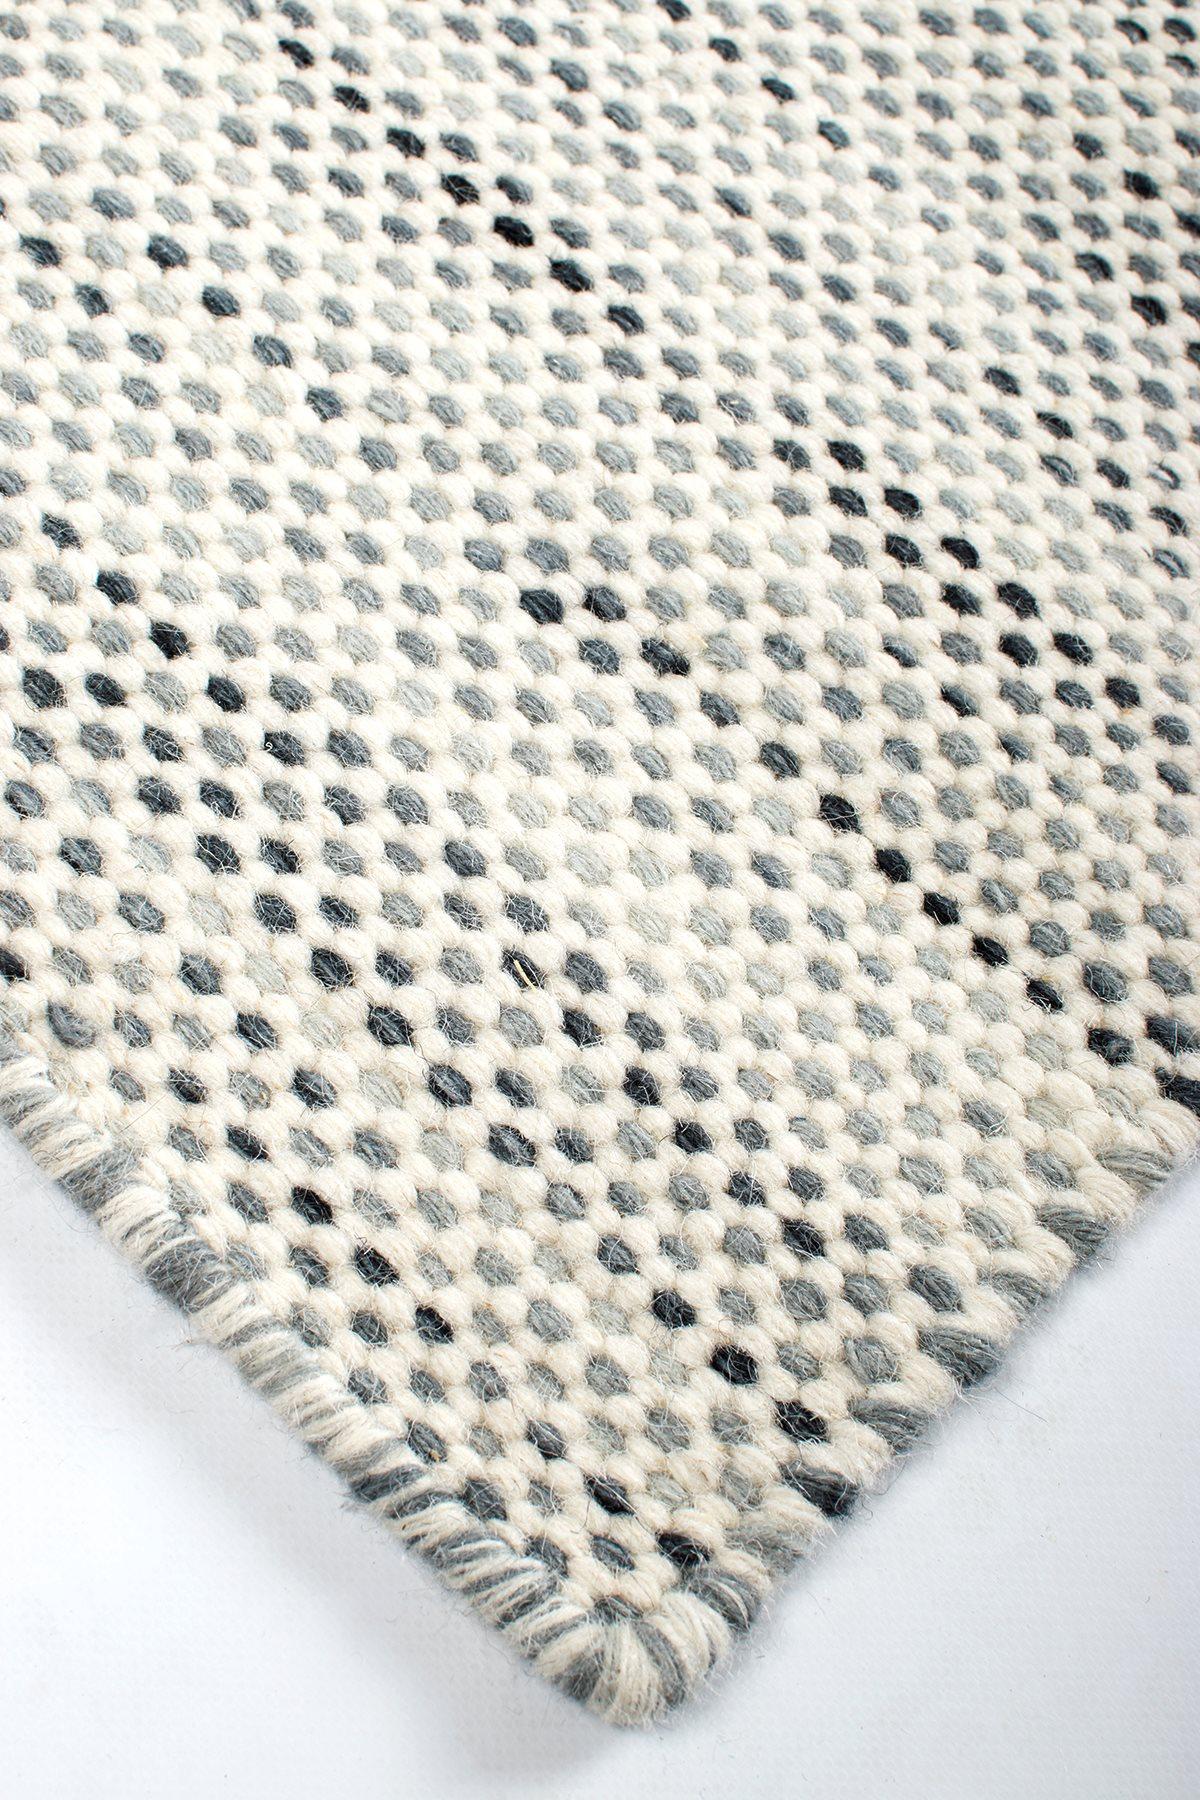 Bali Kelim Taeppe I Ivory Grey Smart Tidslost Design